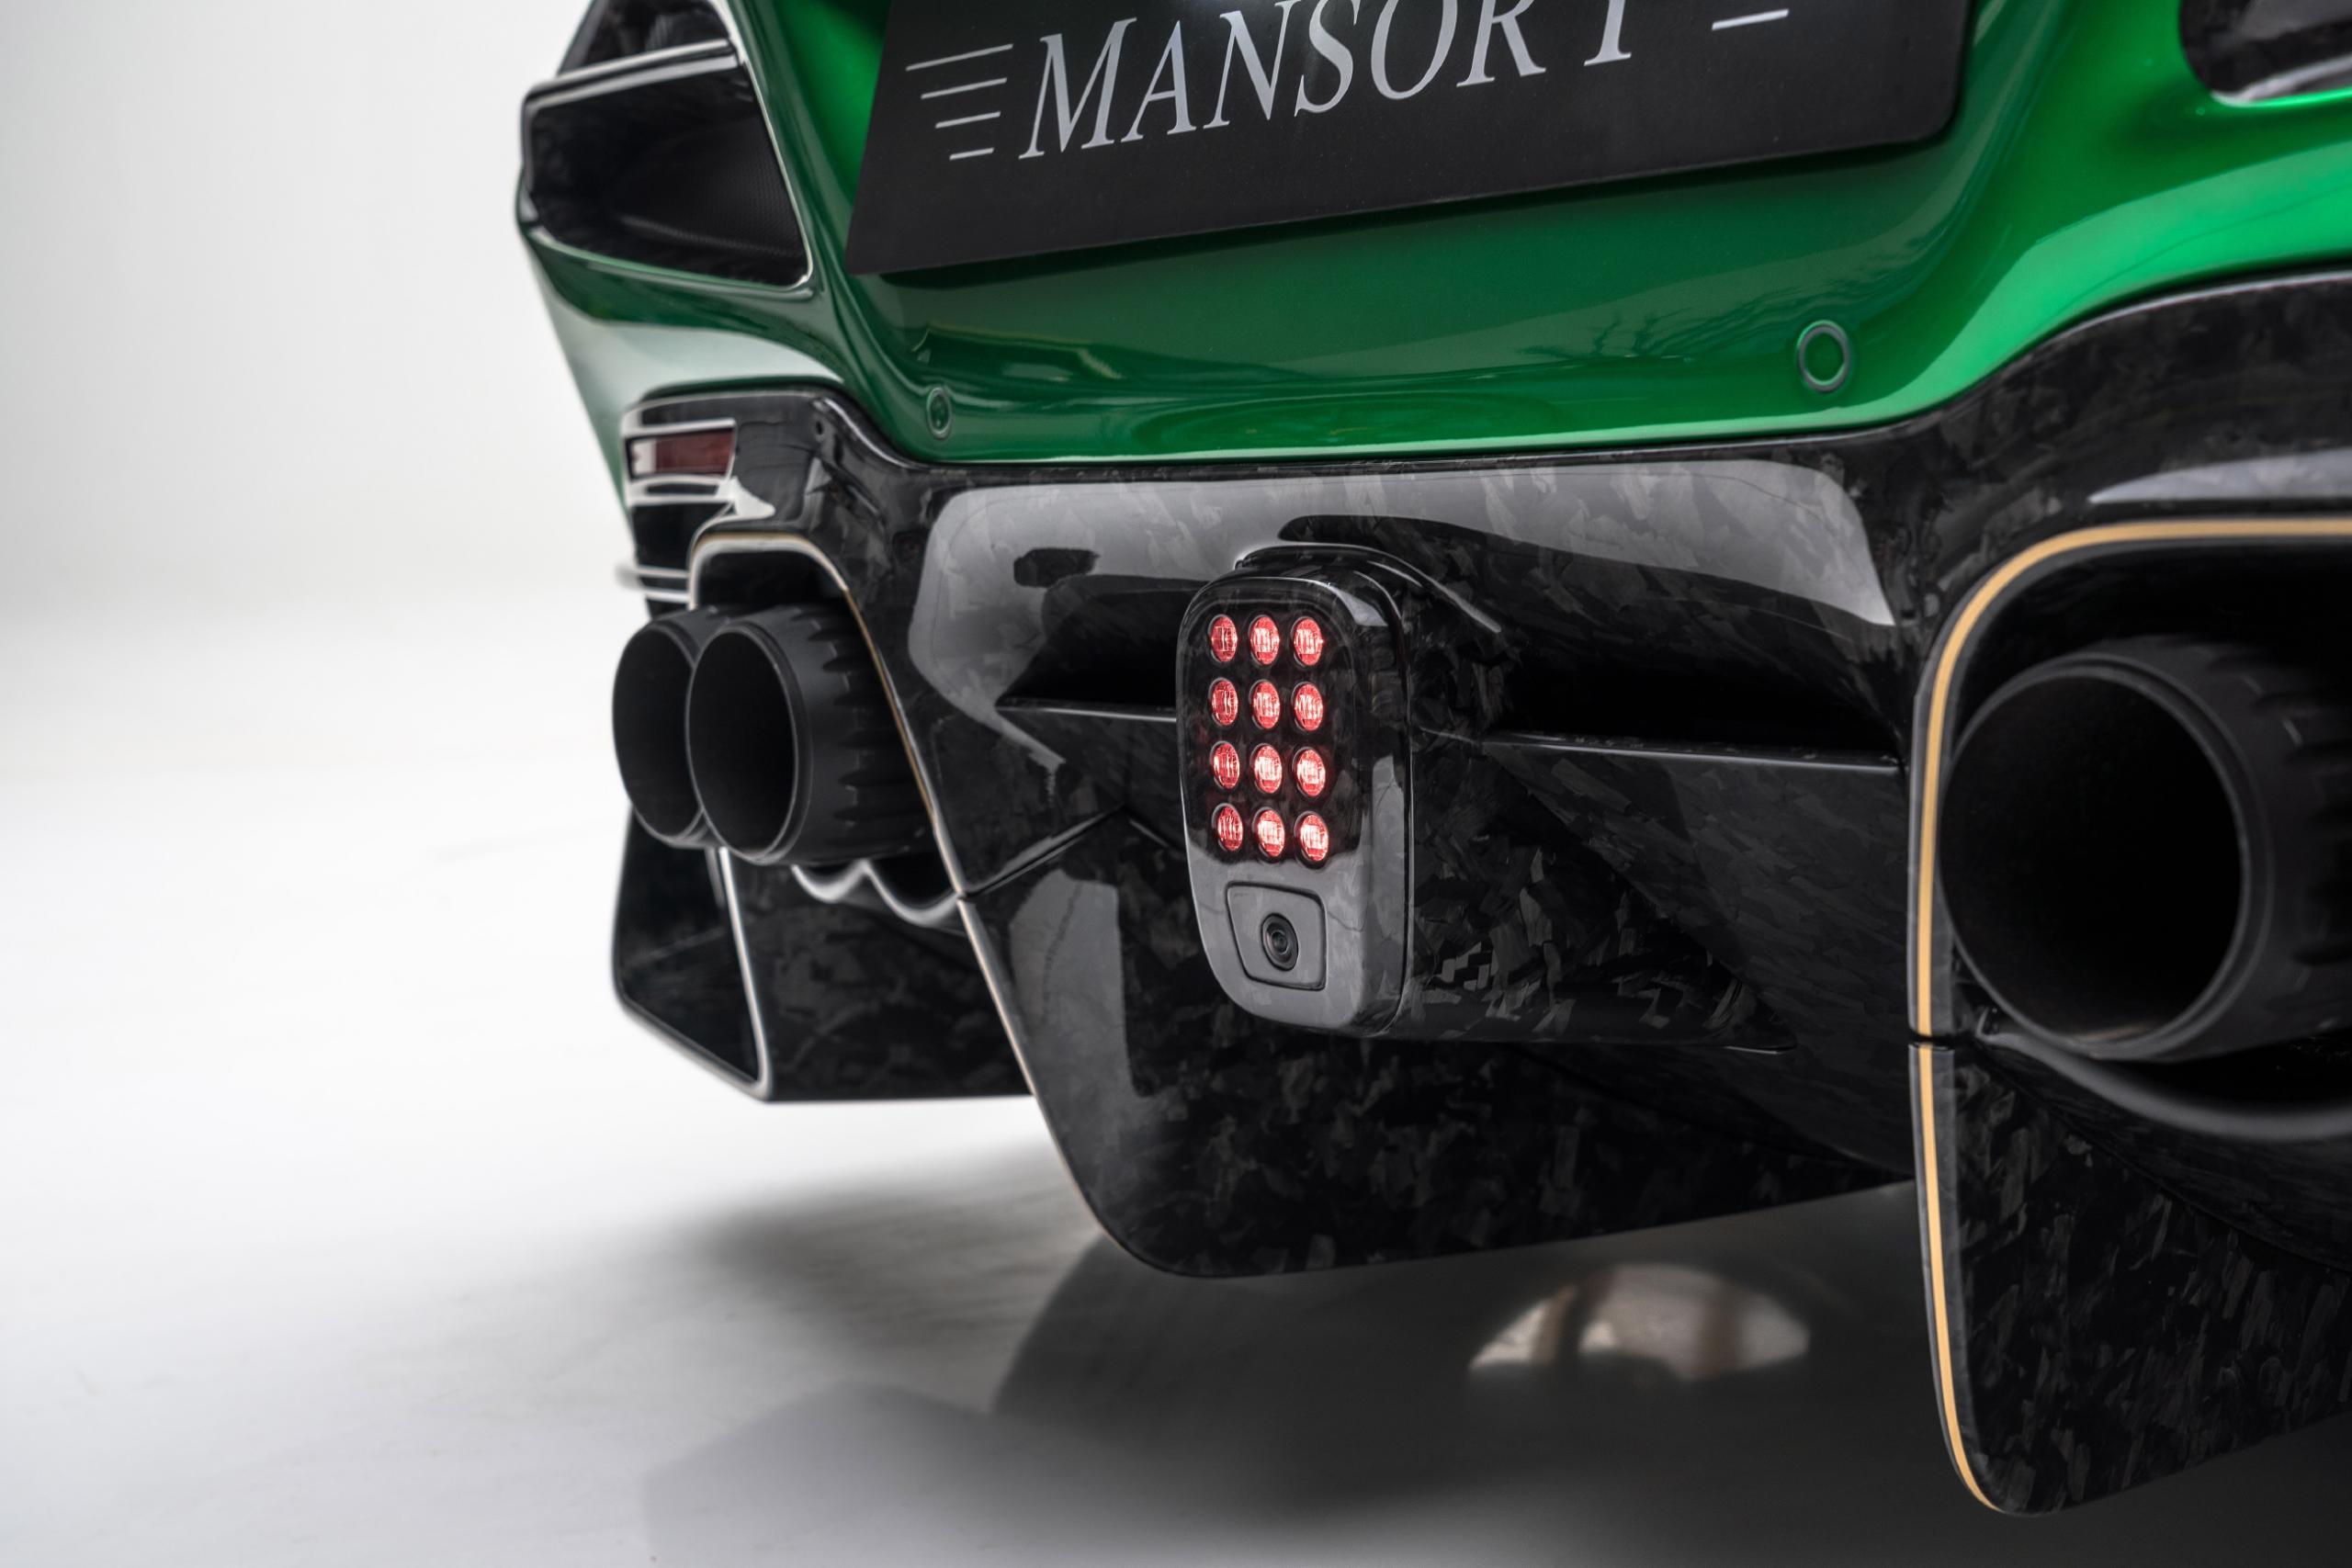 mansory f8xx ferrari f8 body kit carbon fiber rear diffuser sport exhaust system 2020 2021